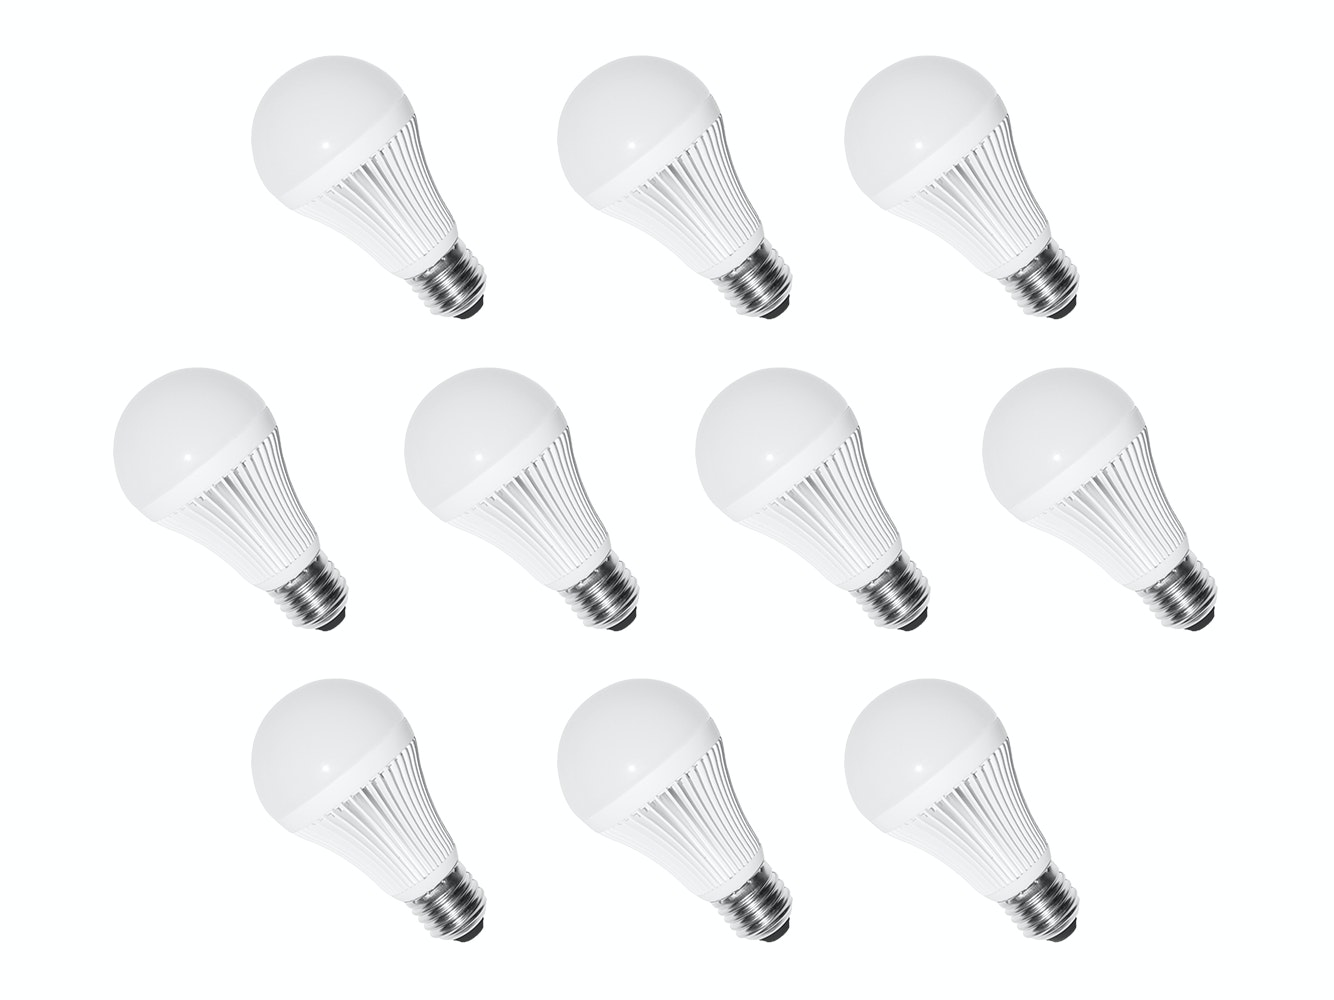 LED Light Bulbs E27 5W Warm White - 10 Pack